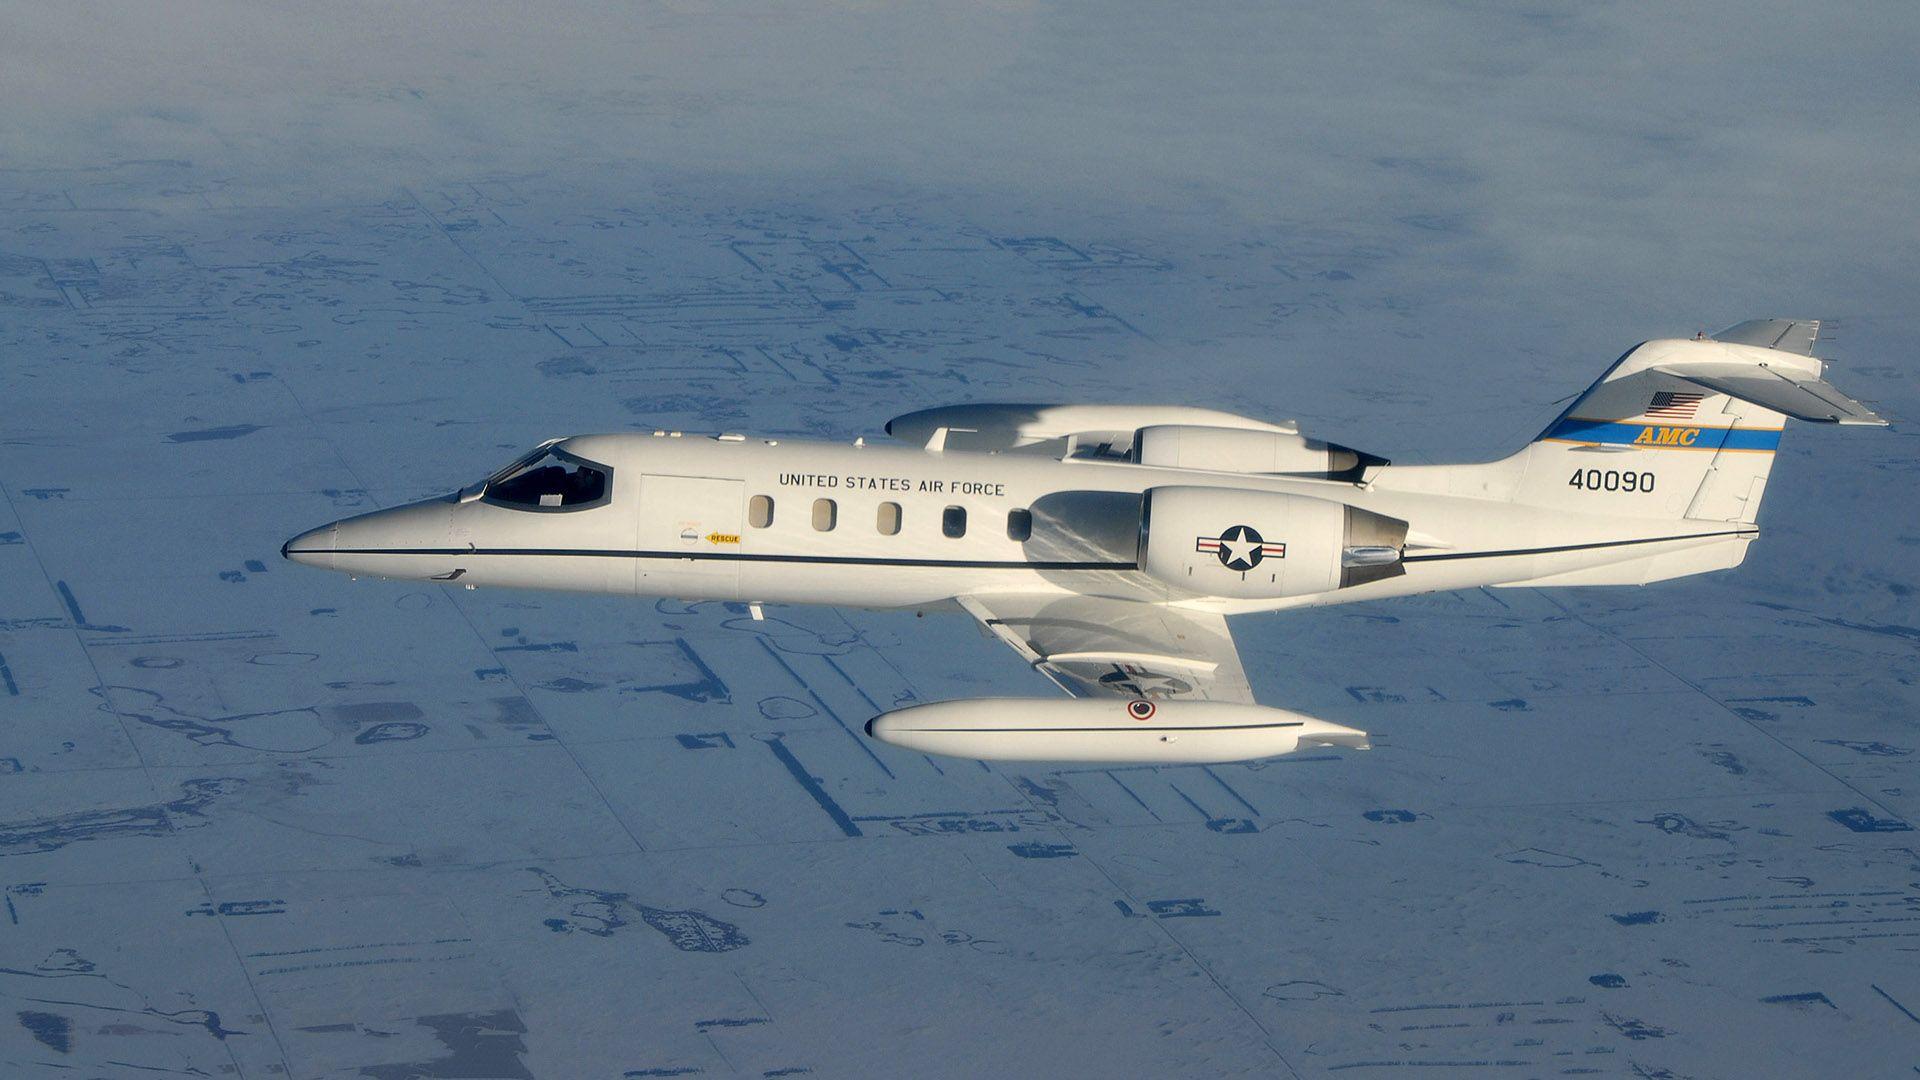 Learjet Inc. has been awarded an estimated 9.5 million